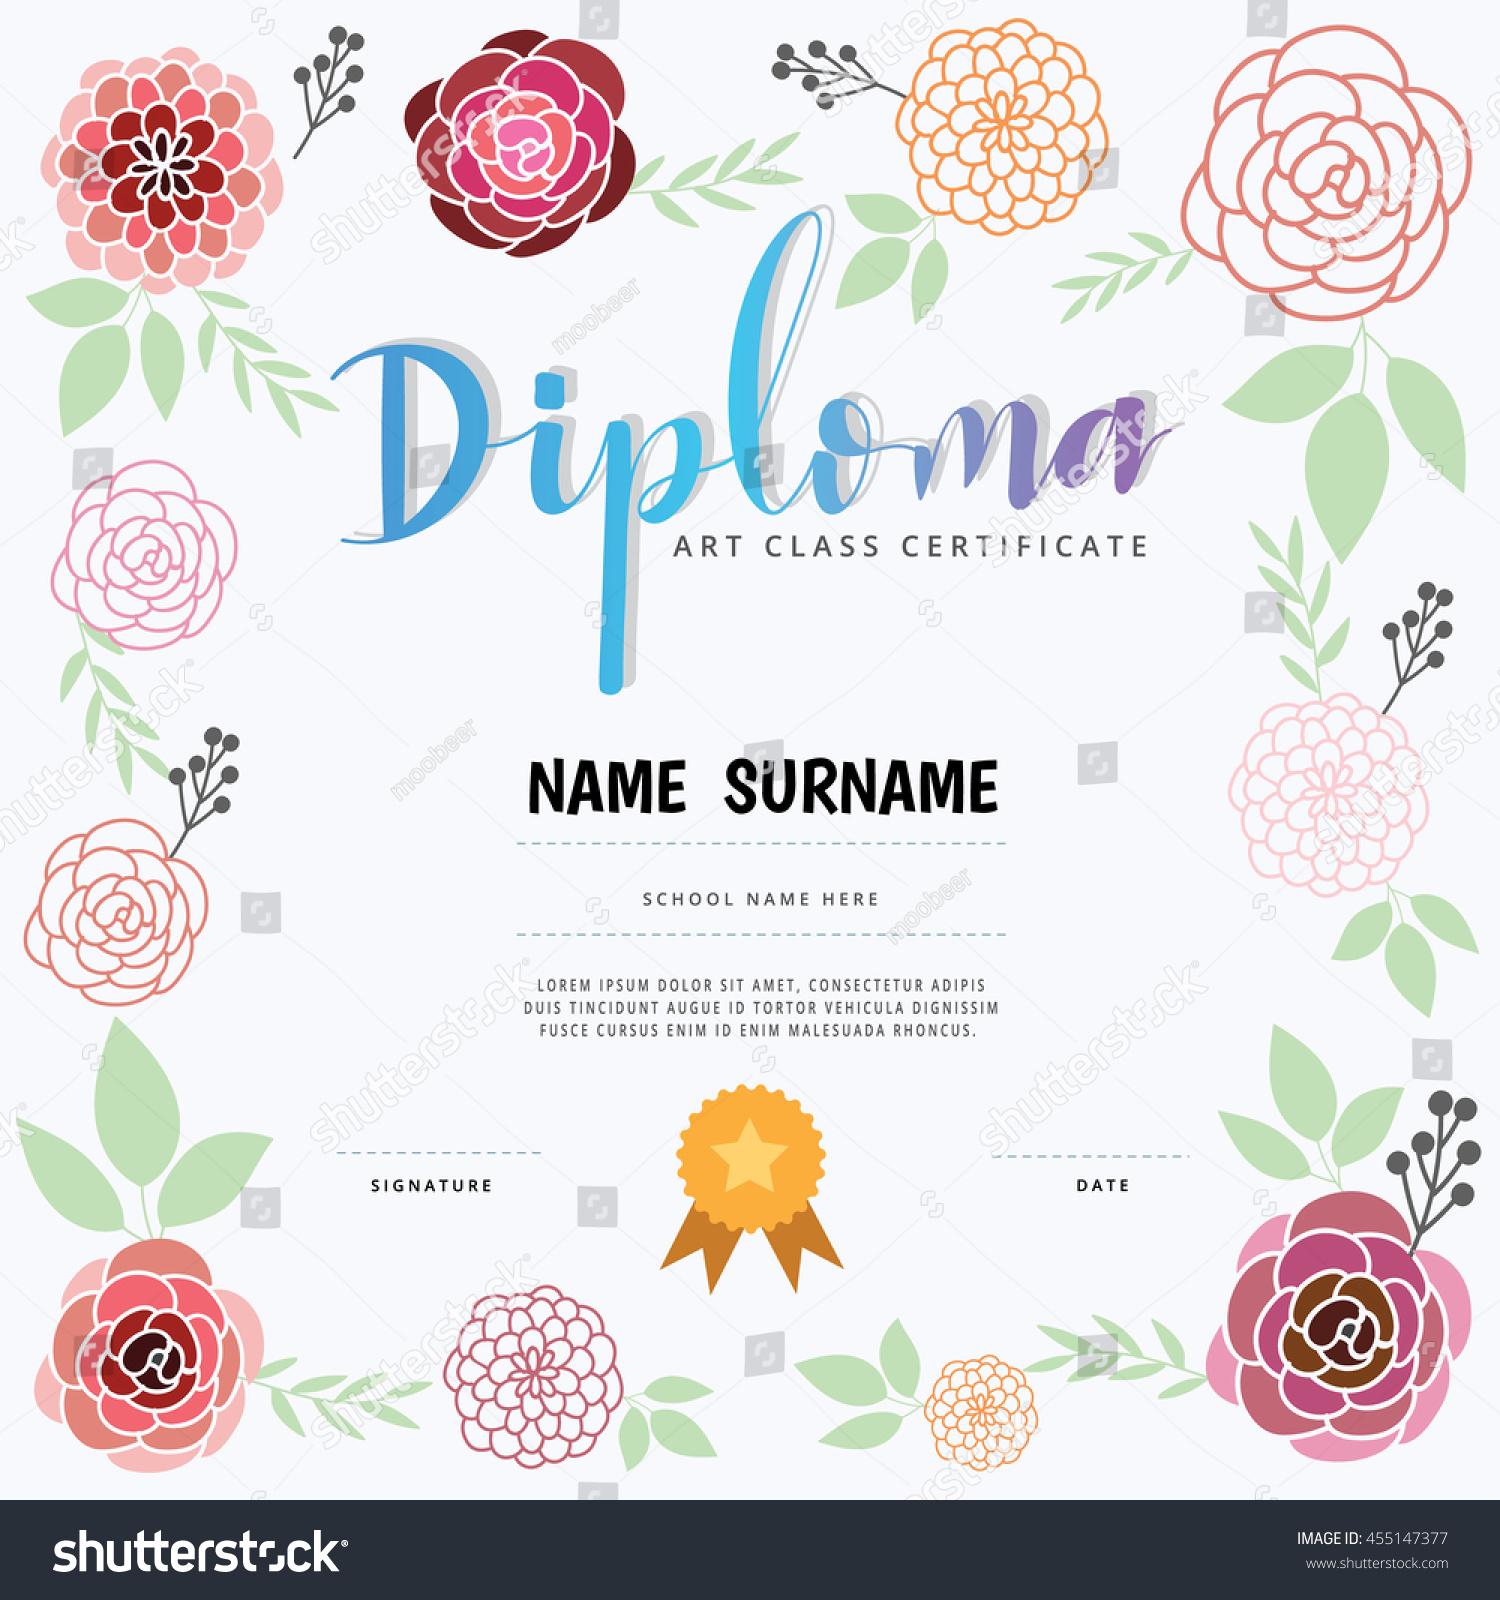 Diploma Art Class Certification Stock Vector Royalty Free